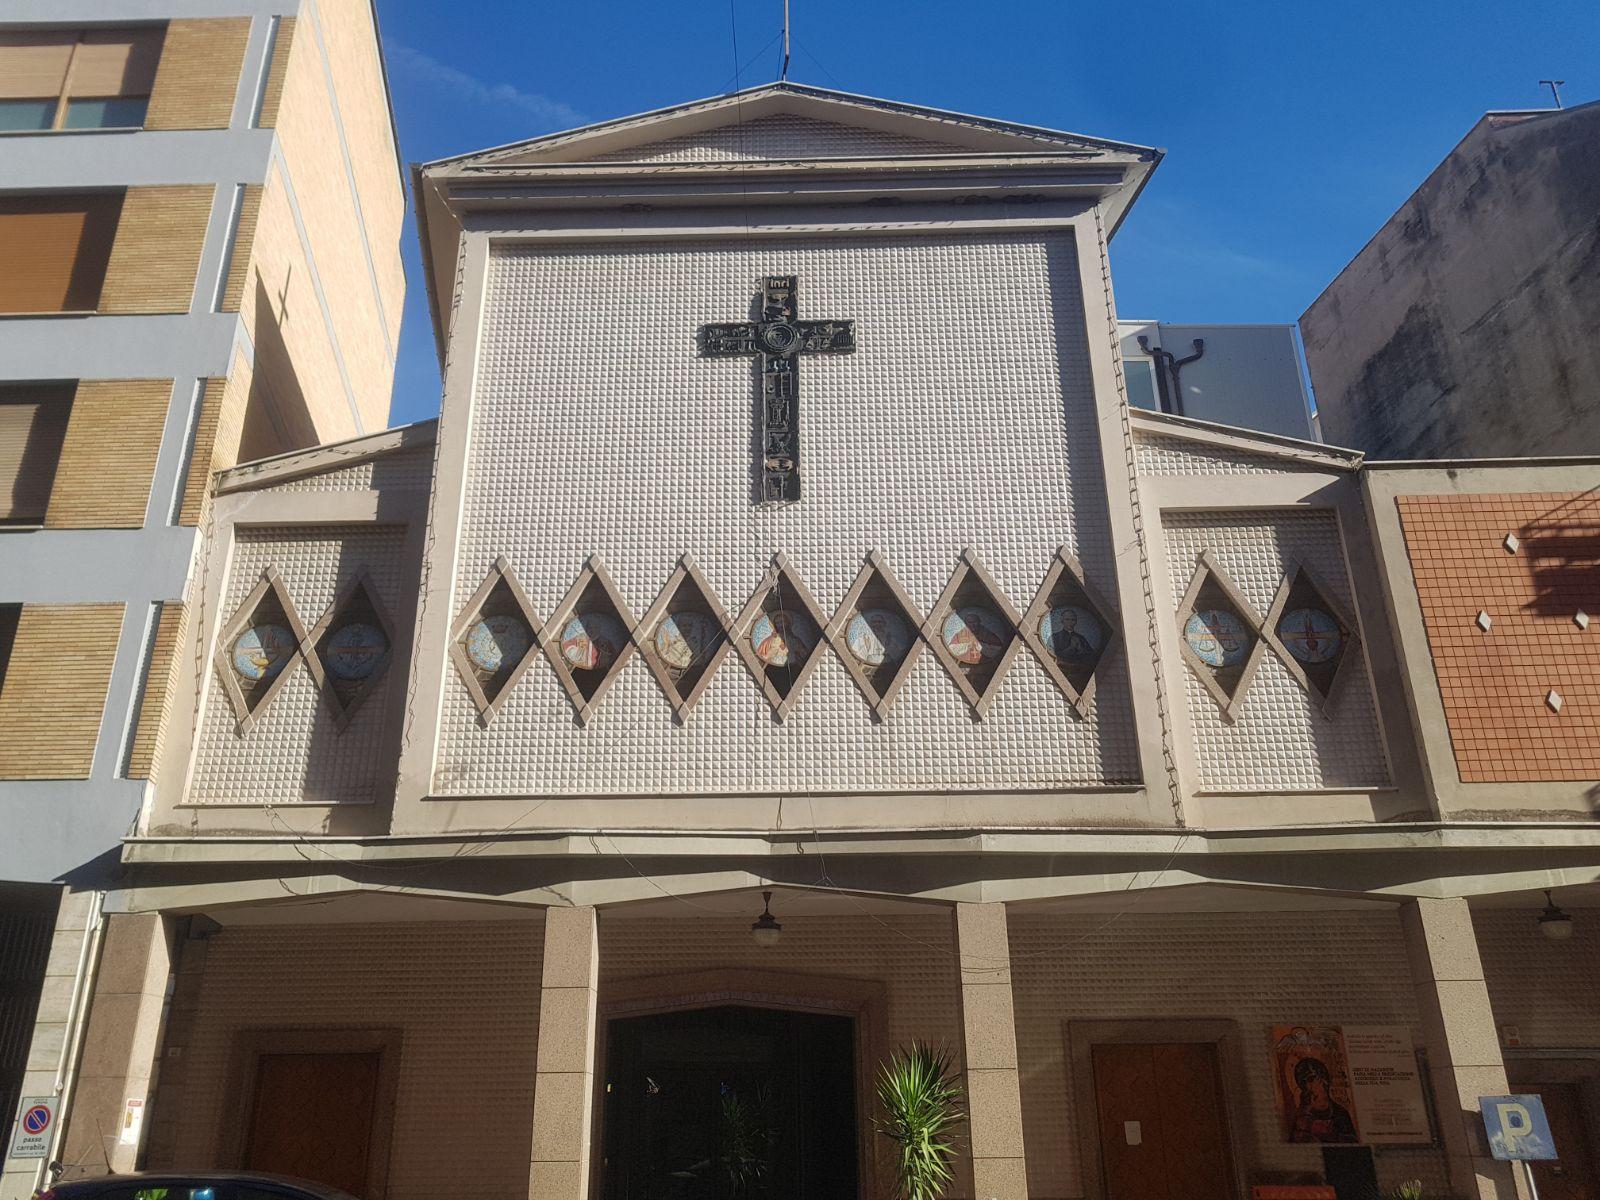 grande chiesa Christian Dating sito